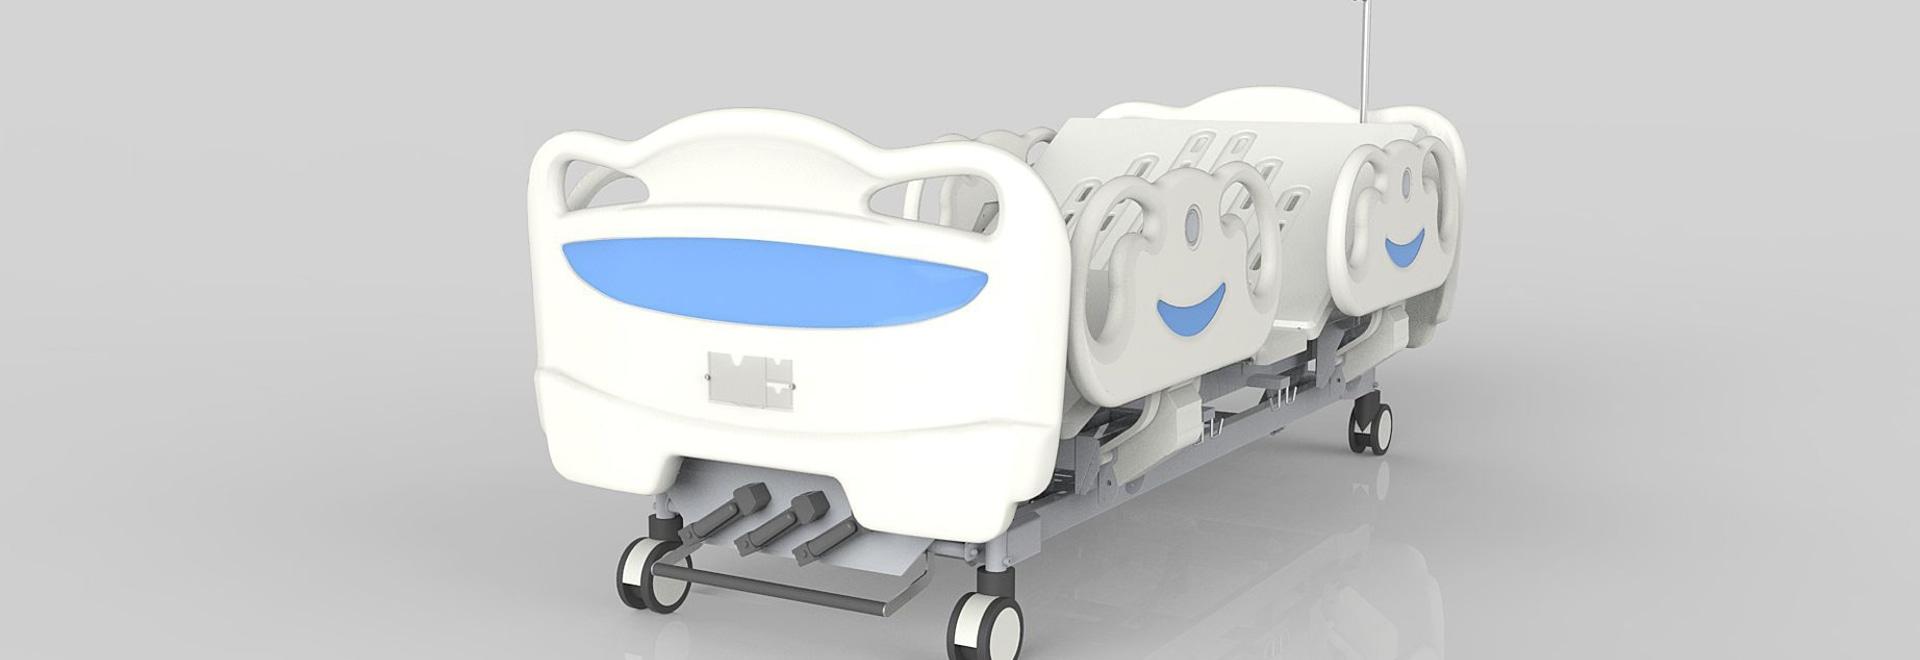 Hospital three function Manual Bed